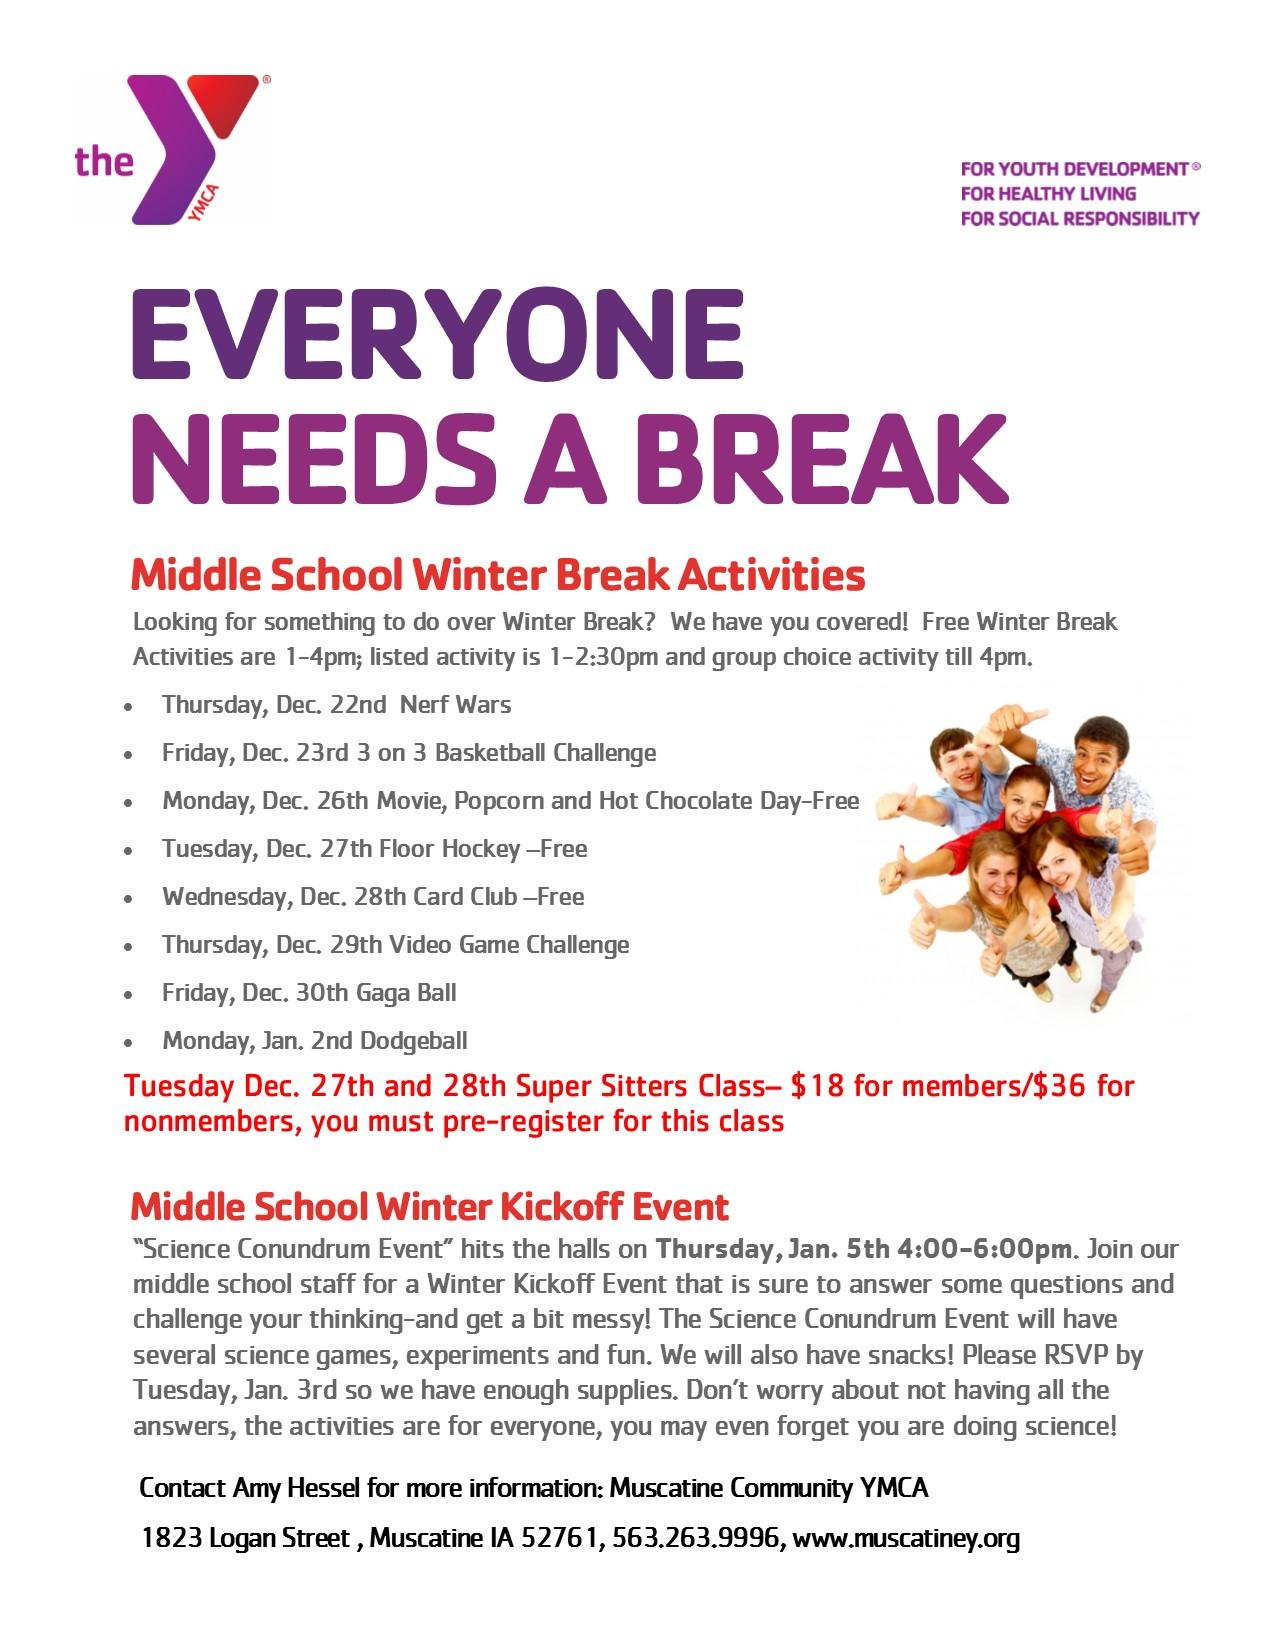 Winter Break Activities At The Y For Middle School